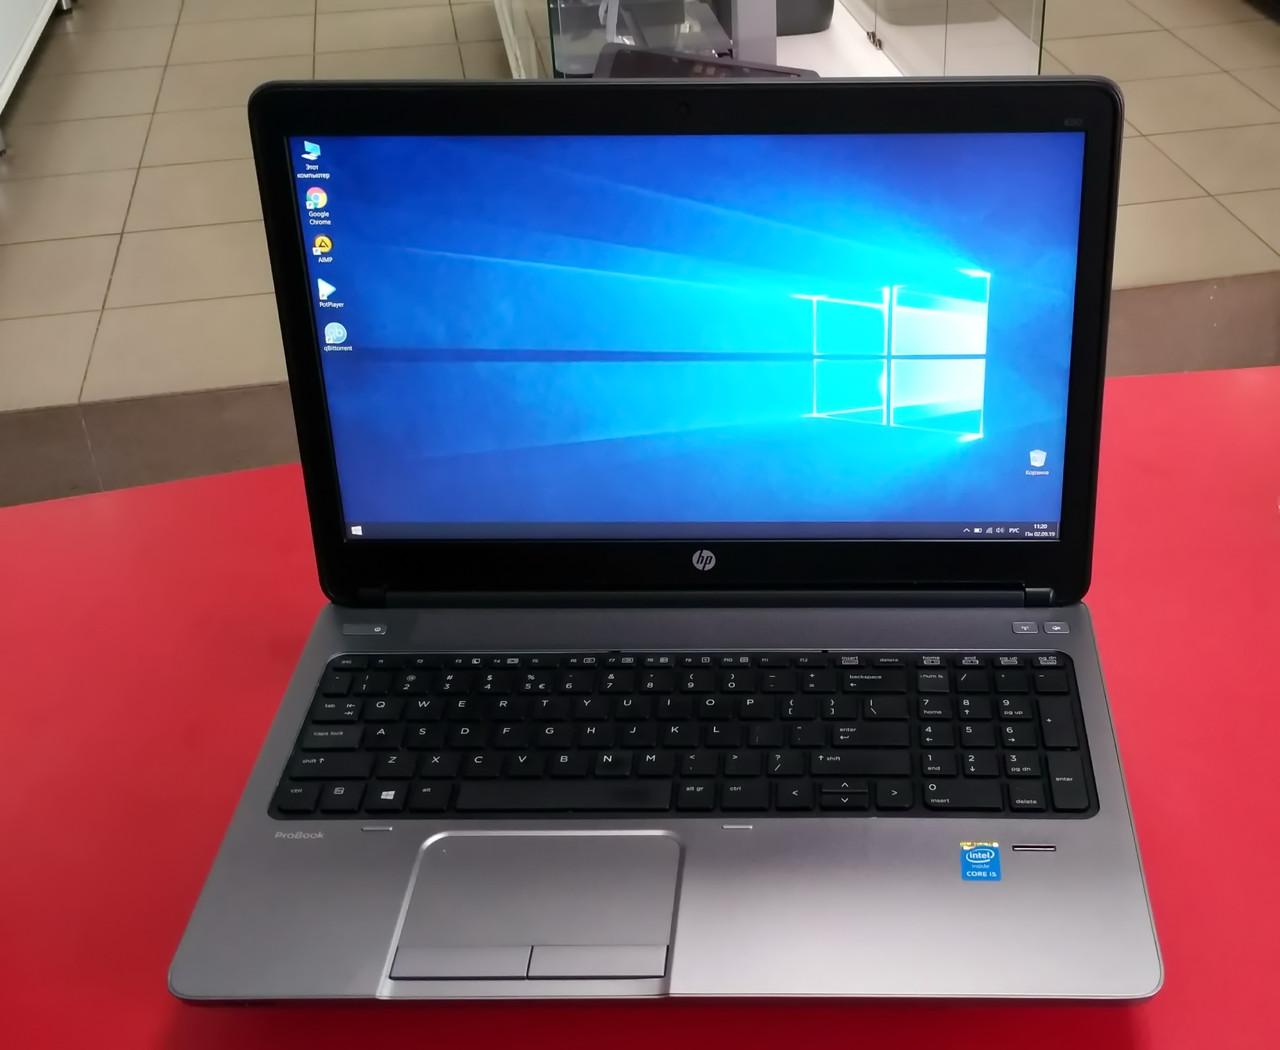 "Ноутбук HP ProBook 650 G1 15.6"" Intel Core i5 2.5 GHz 4 GB RAM 320 HDD Black-Silver Б/У"